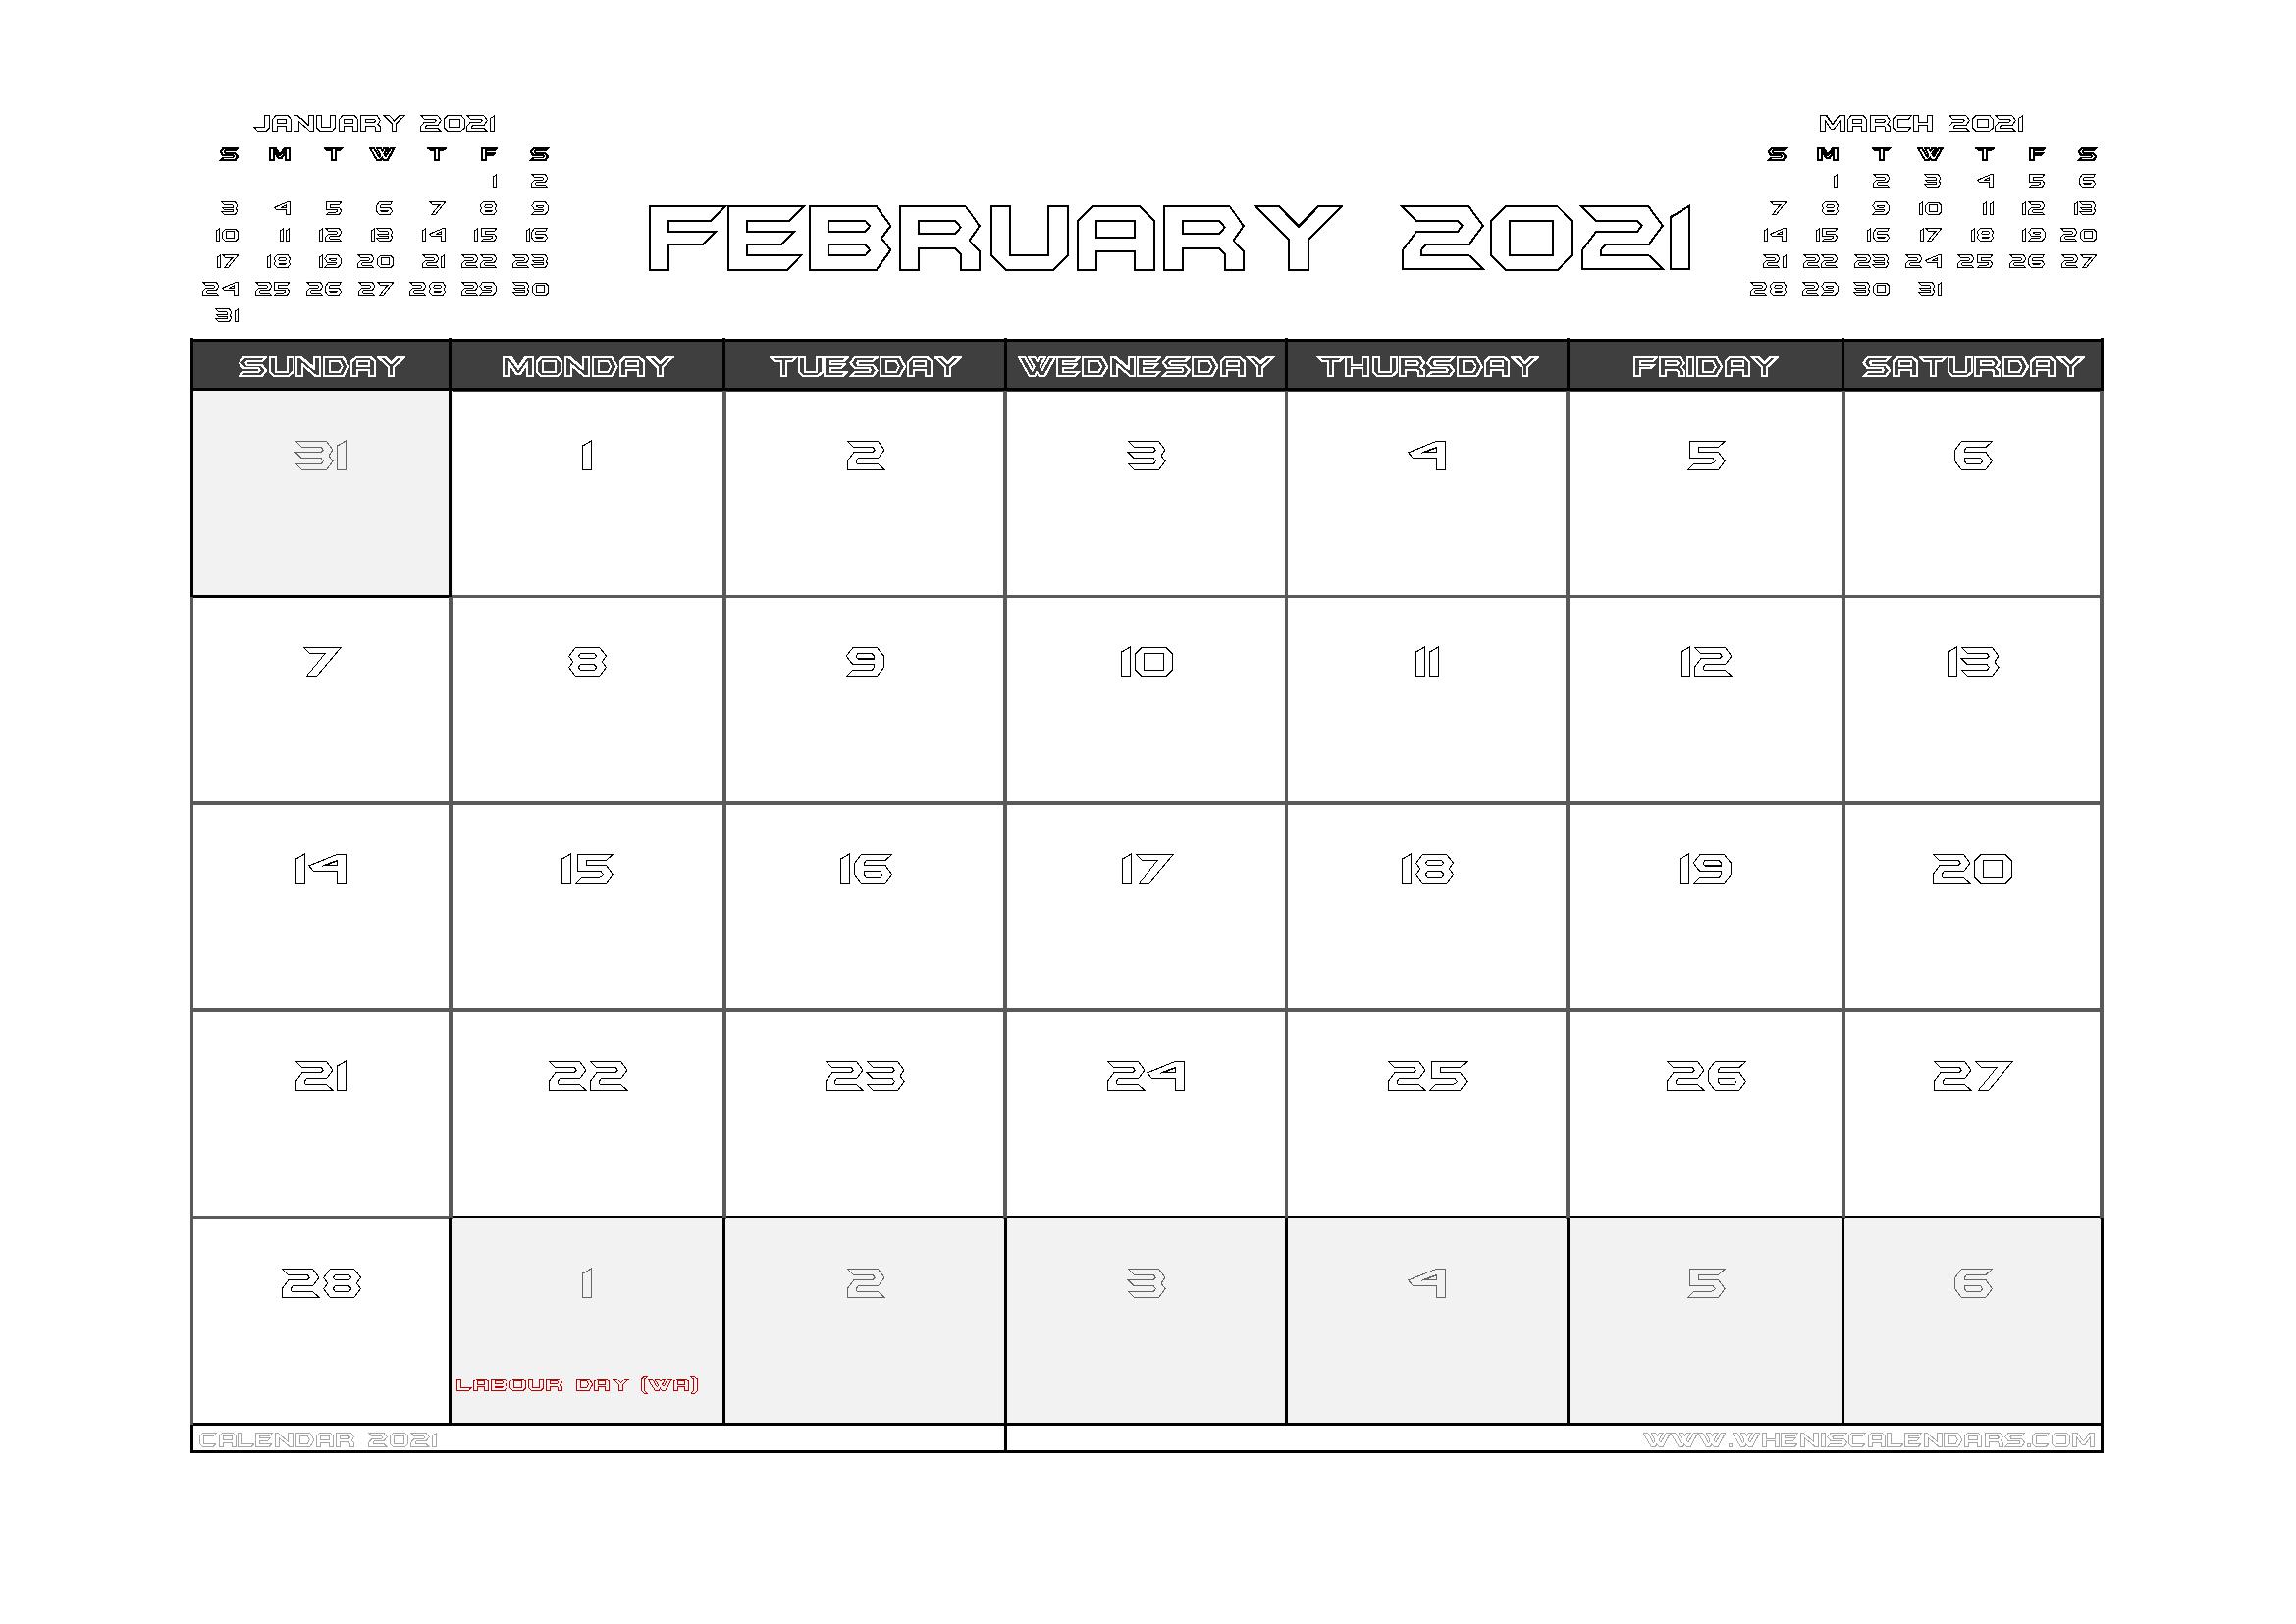 February 2021 Calendar Australia with Holidays